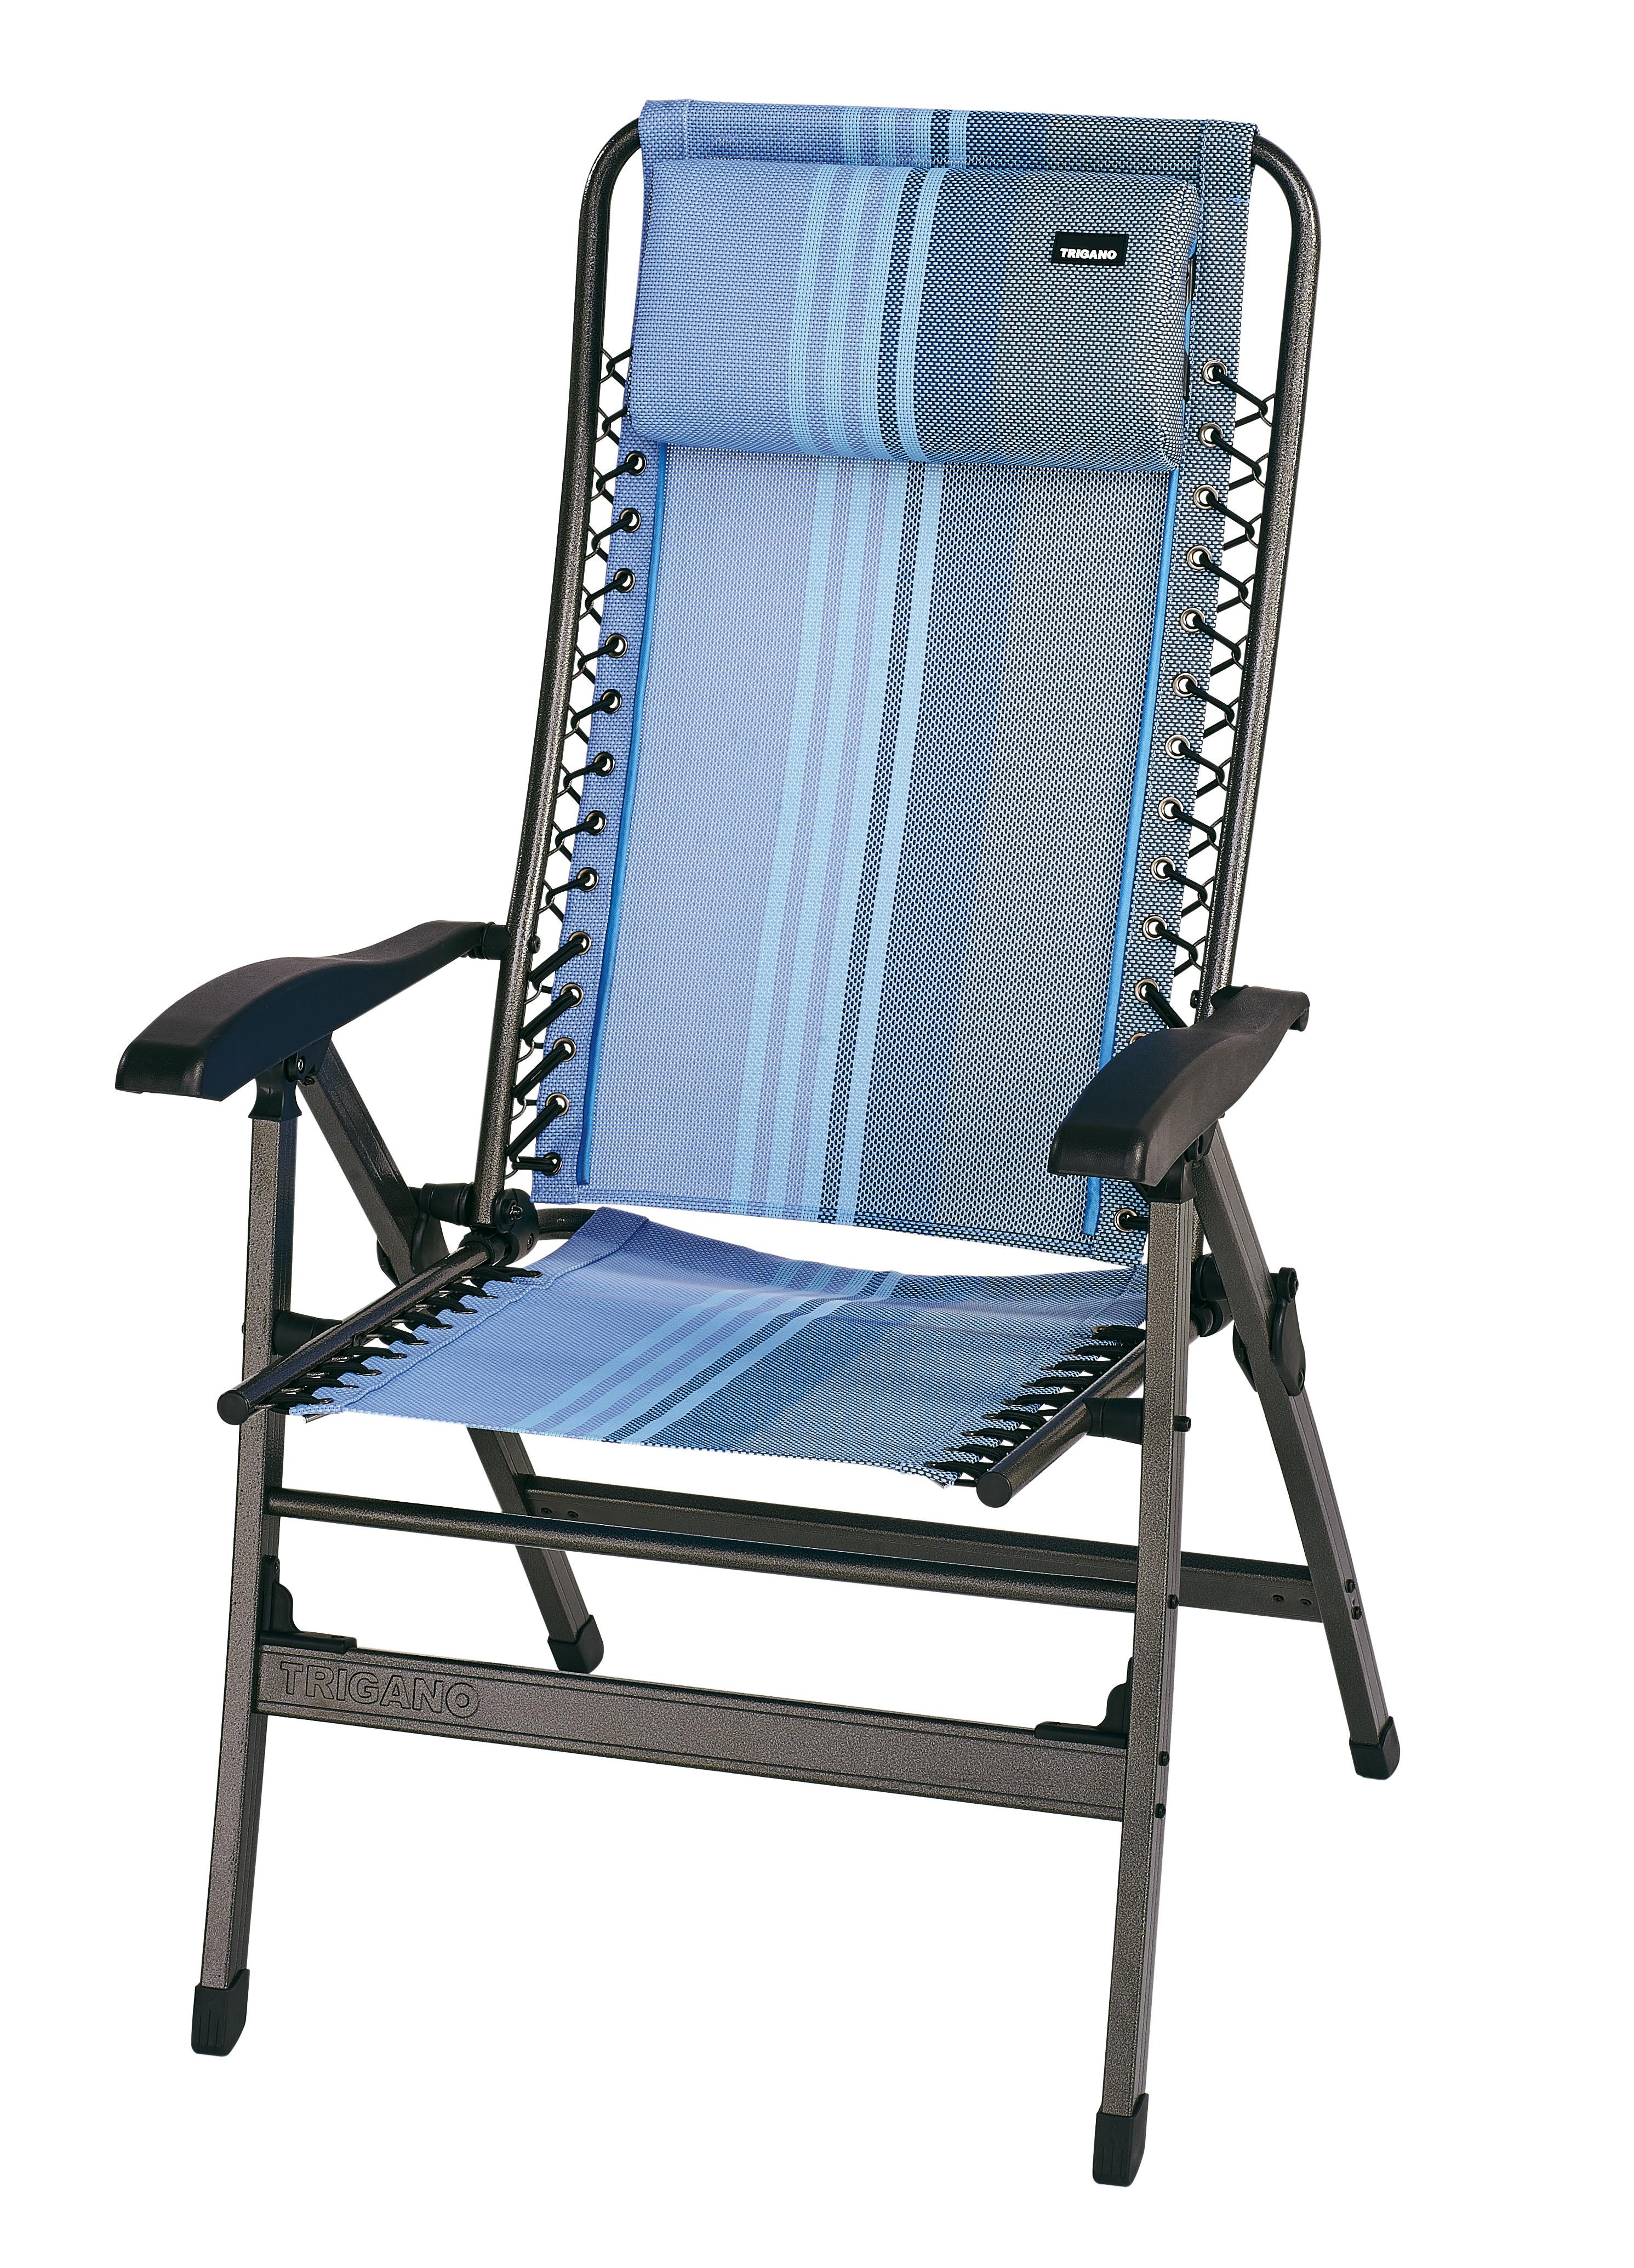 fauteuil pliant trigano 60590 fauteuil id es. Black Bedroom Furniture Sets. Home Design Ideas